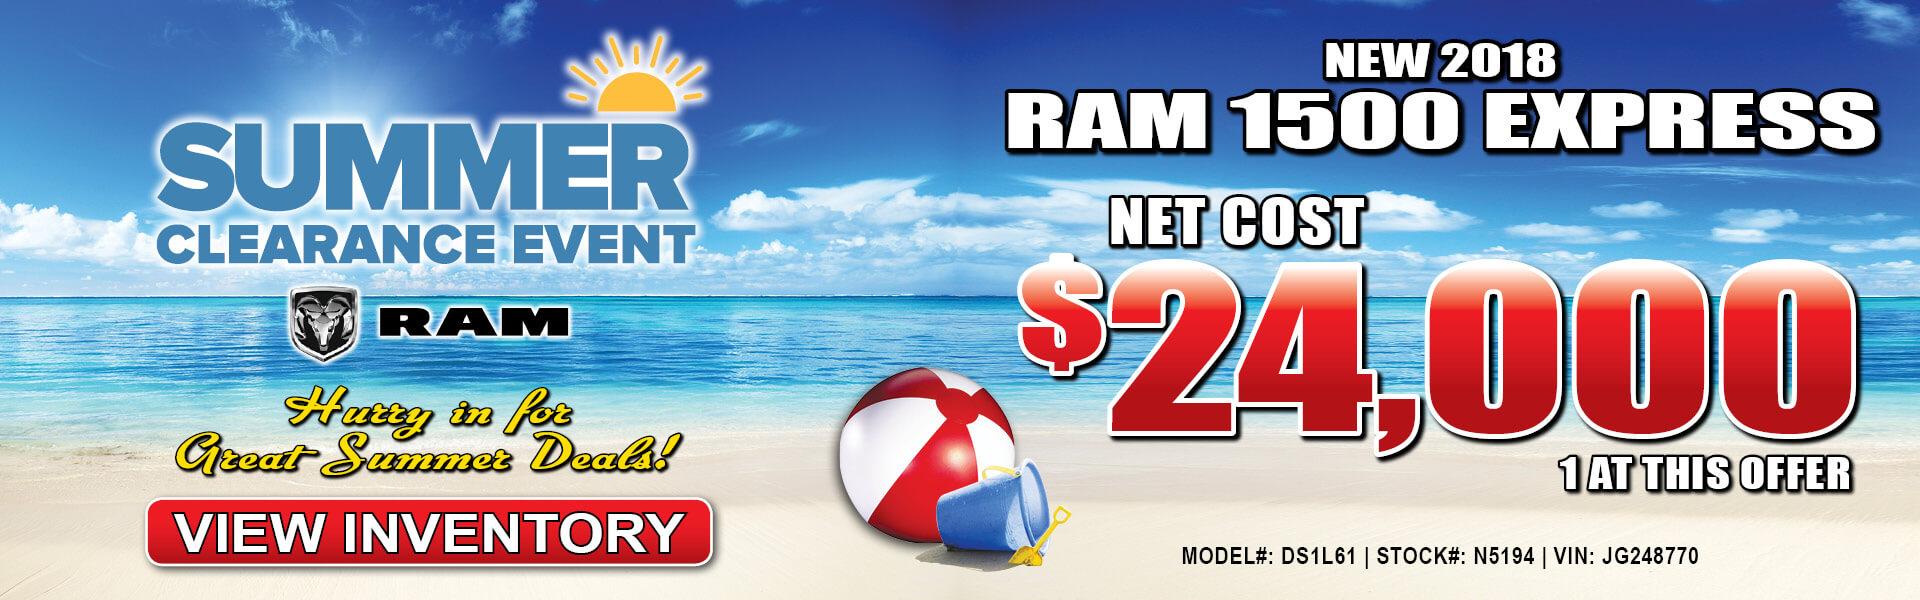 Ram 1500 Express $24,000